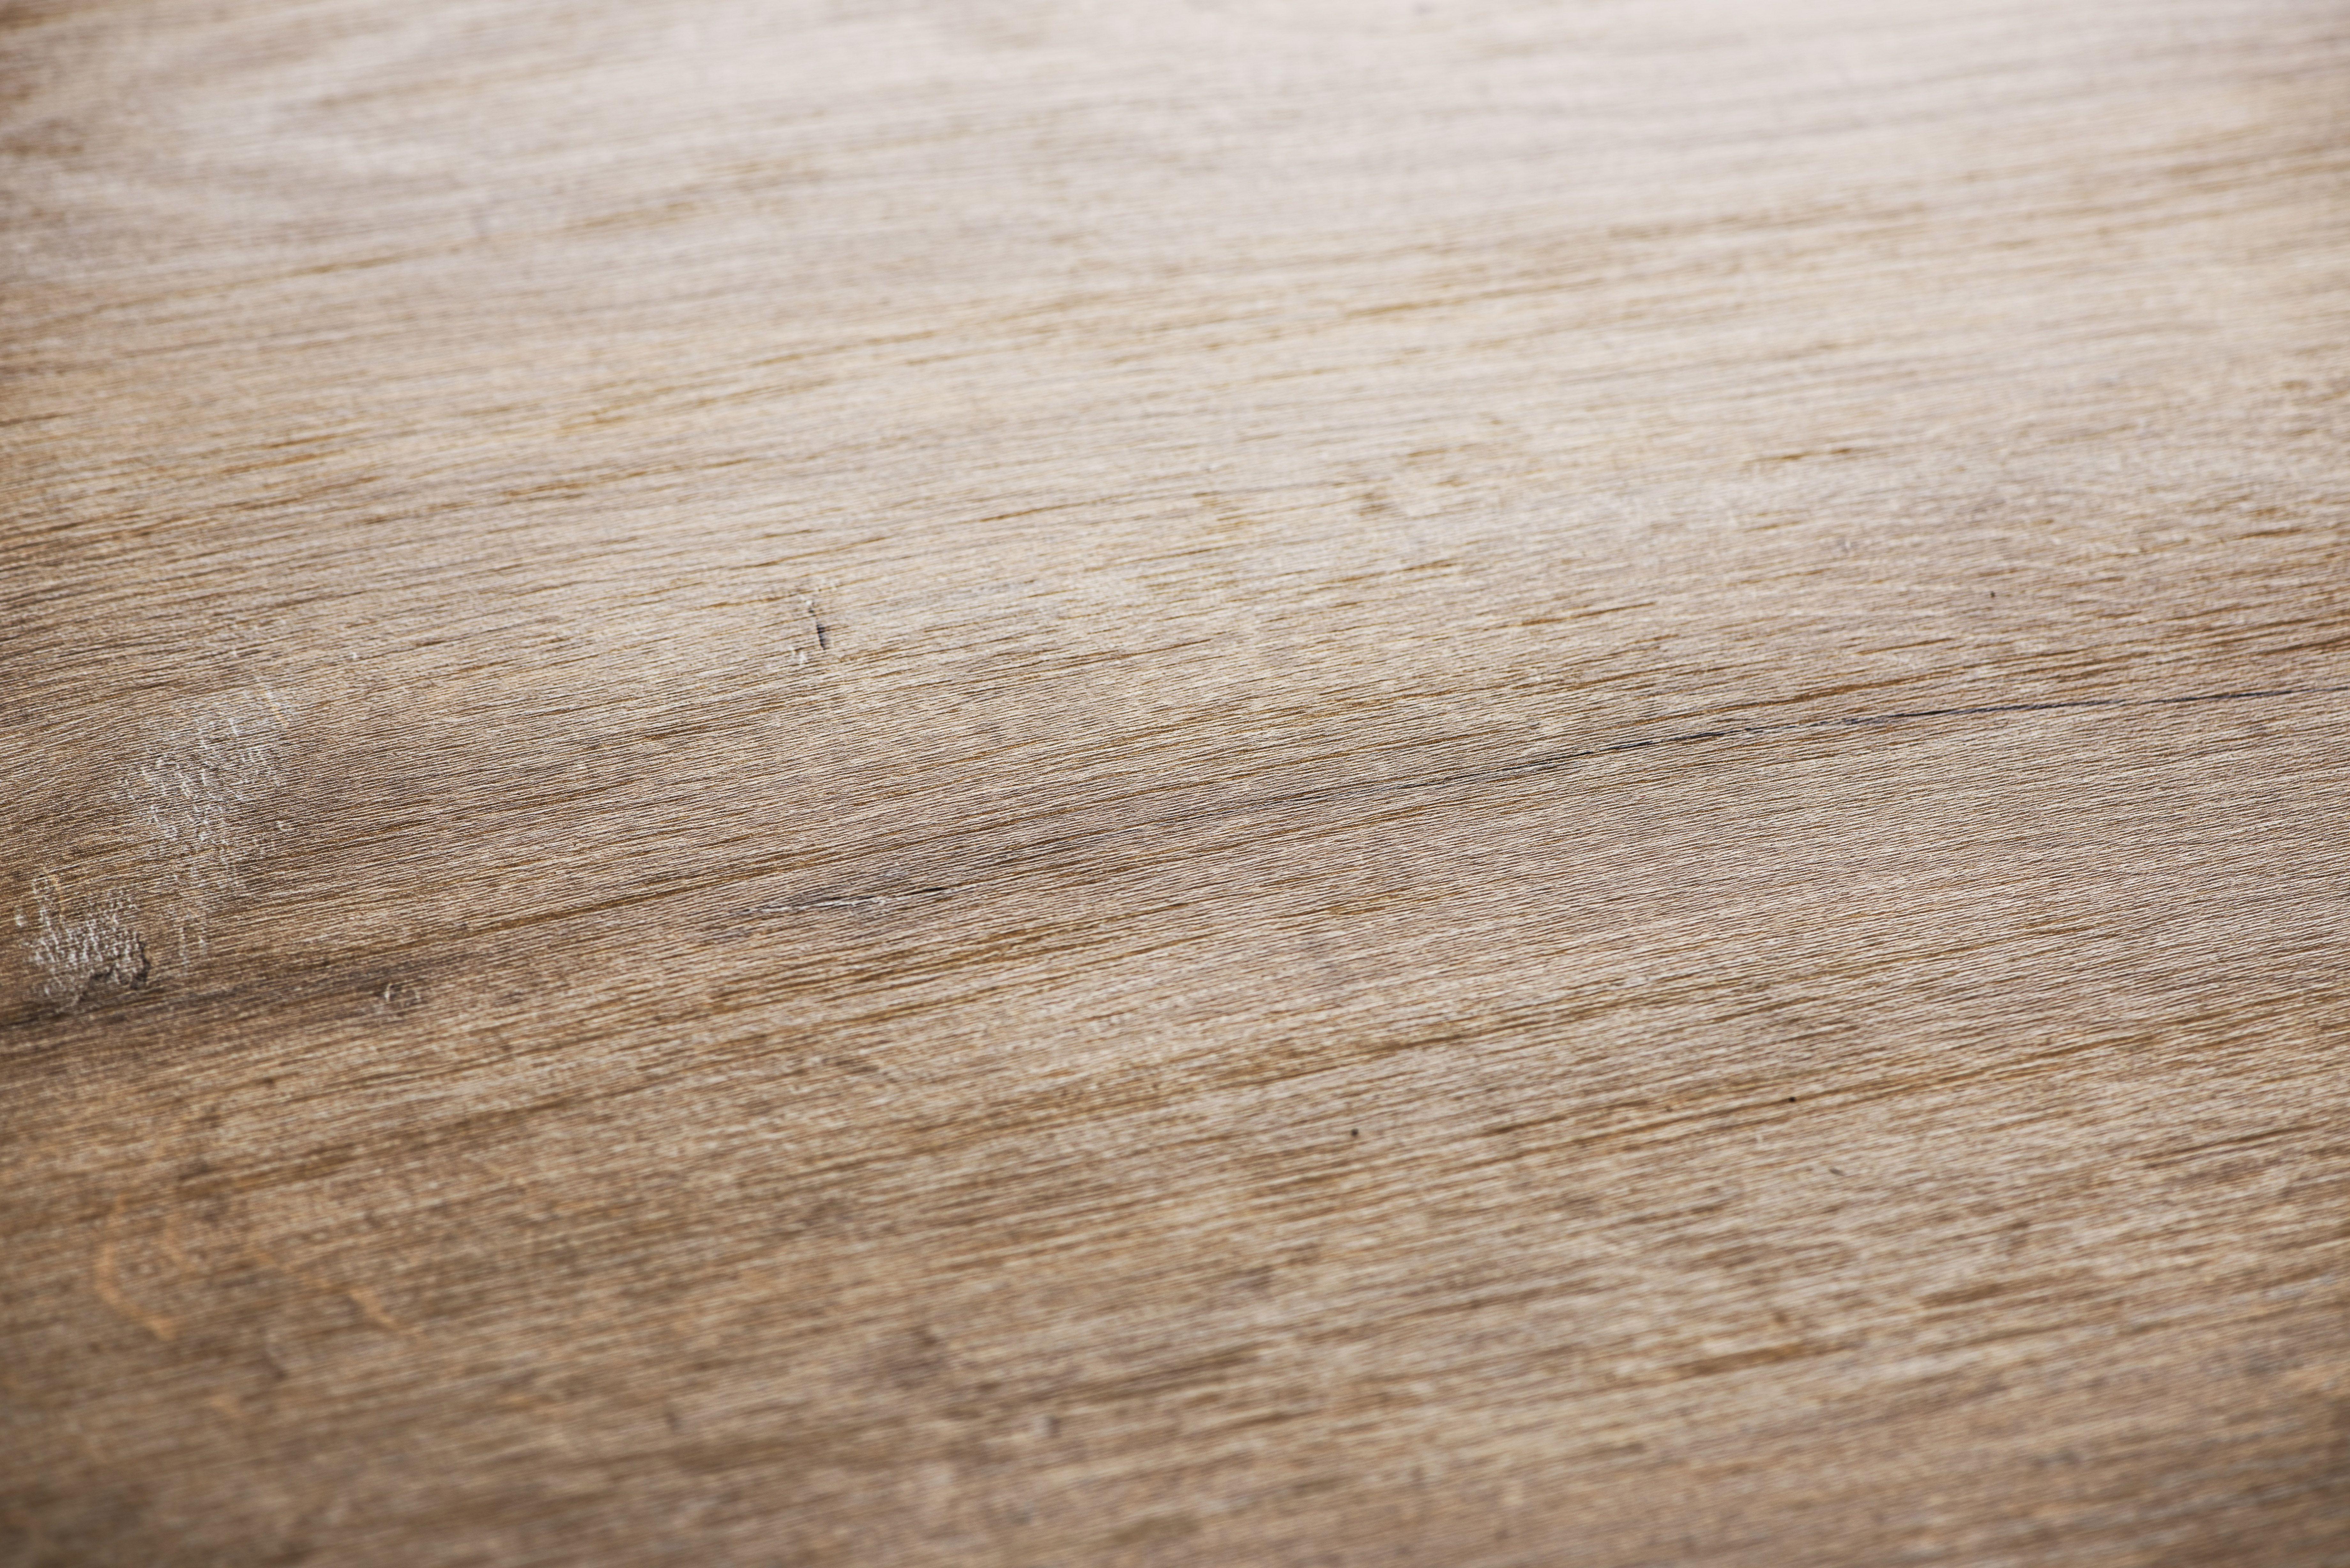 H782 W06 Romantic Oak Brown Melamine Wood Nature Inspiration Wood Texture